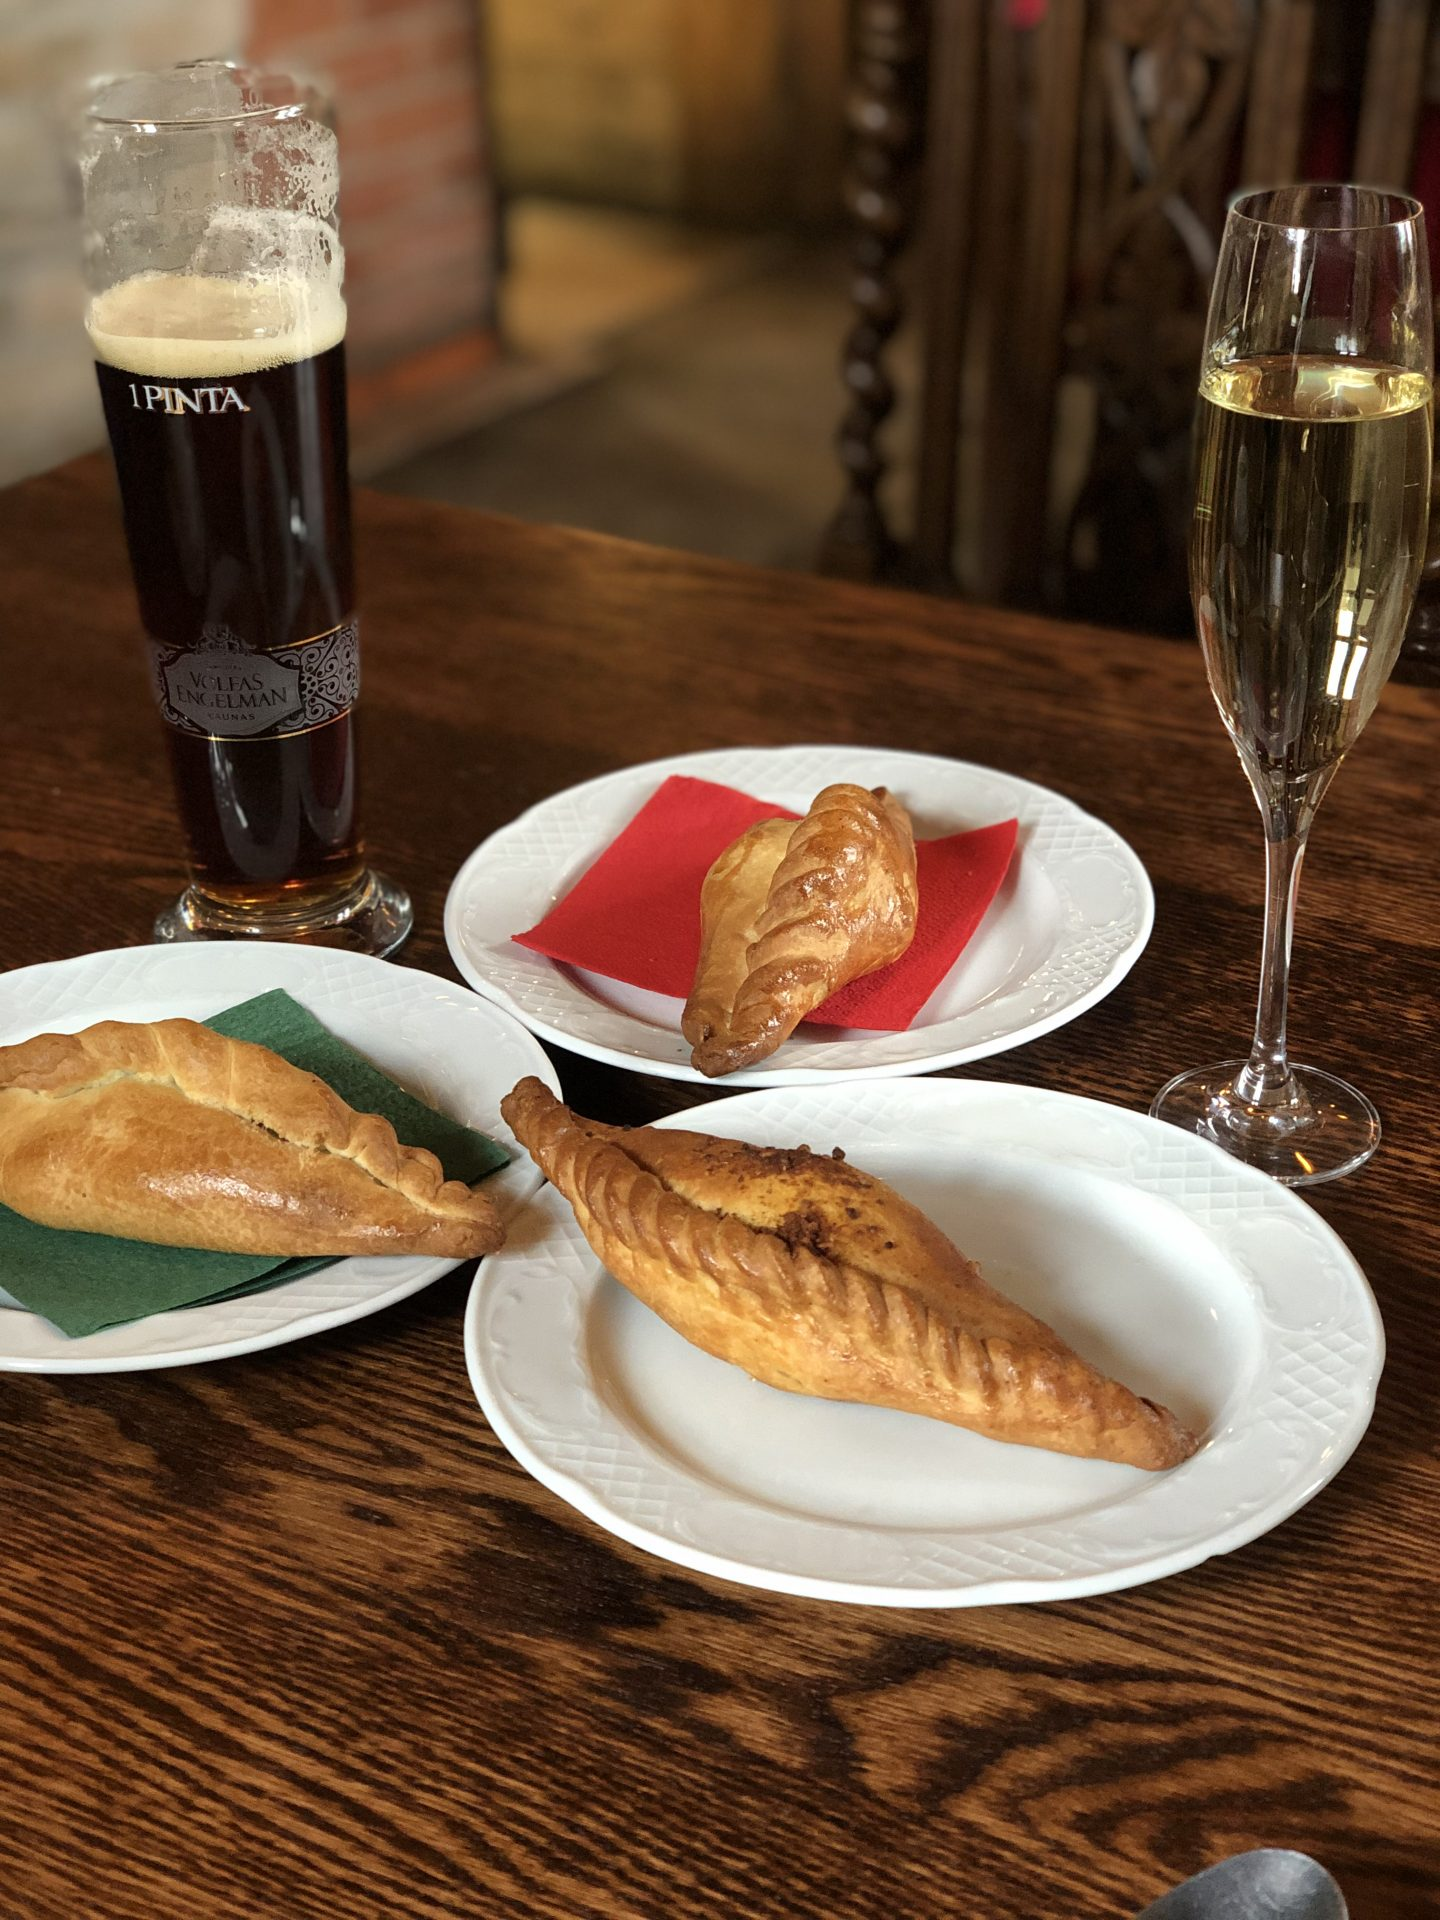 best restaurants in Vilnius: Kibinine at Senoji Kibininė, on three white plates with a glass of sparkling wine and a beer next to them